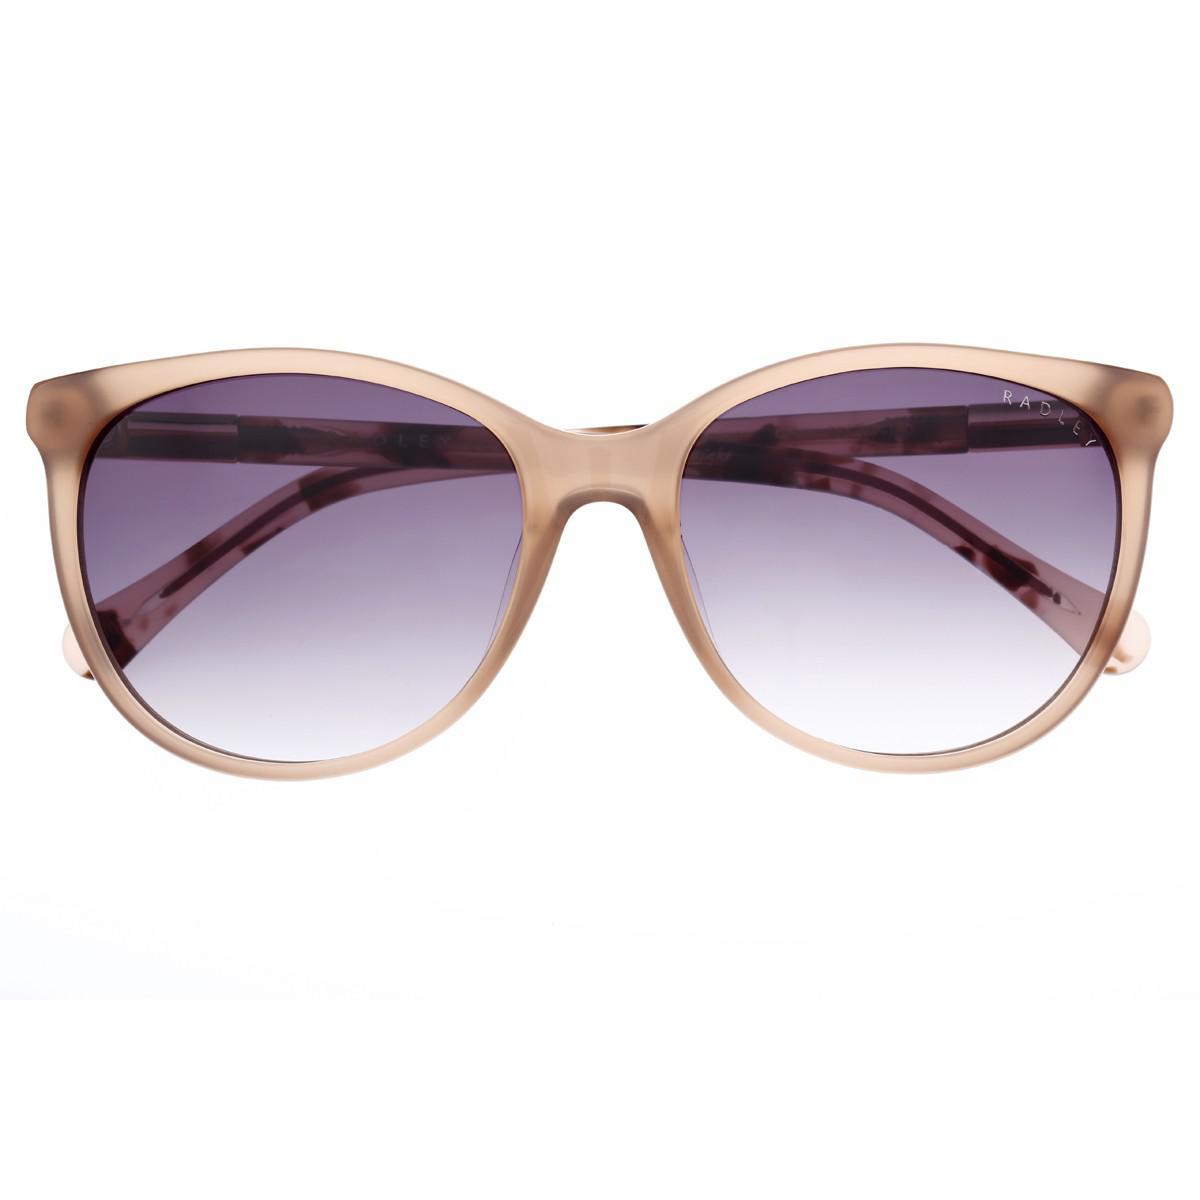 e56b0a9ba37 Radley Edie Sunglasses - Lyst